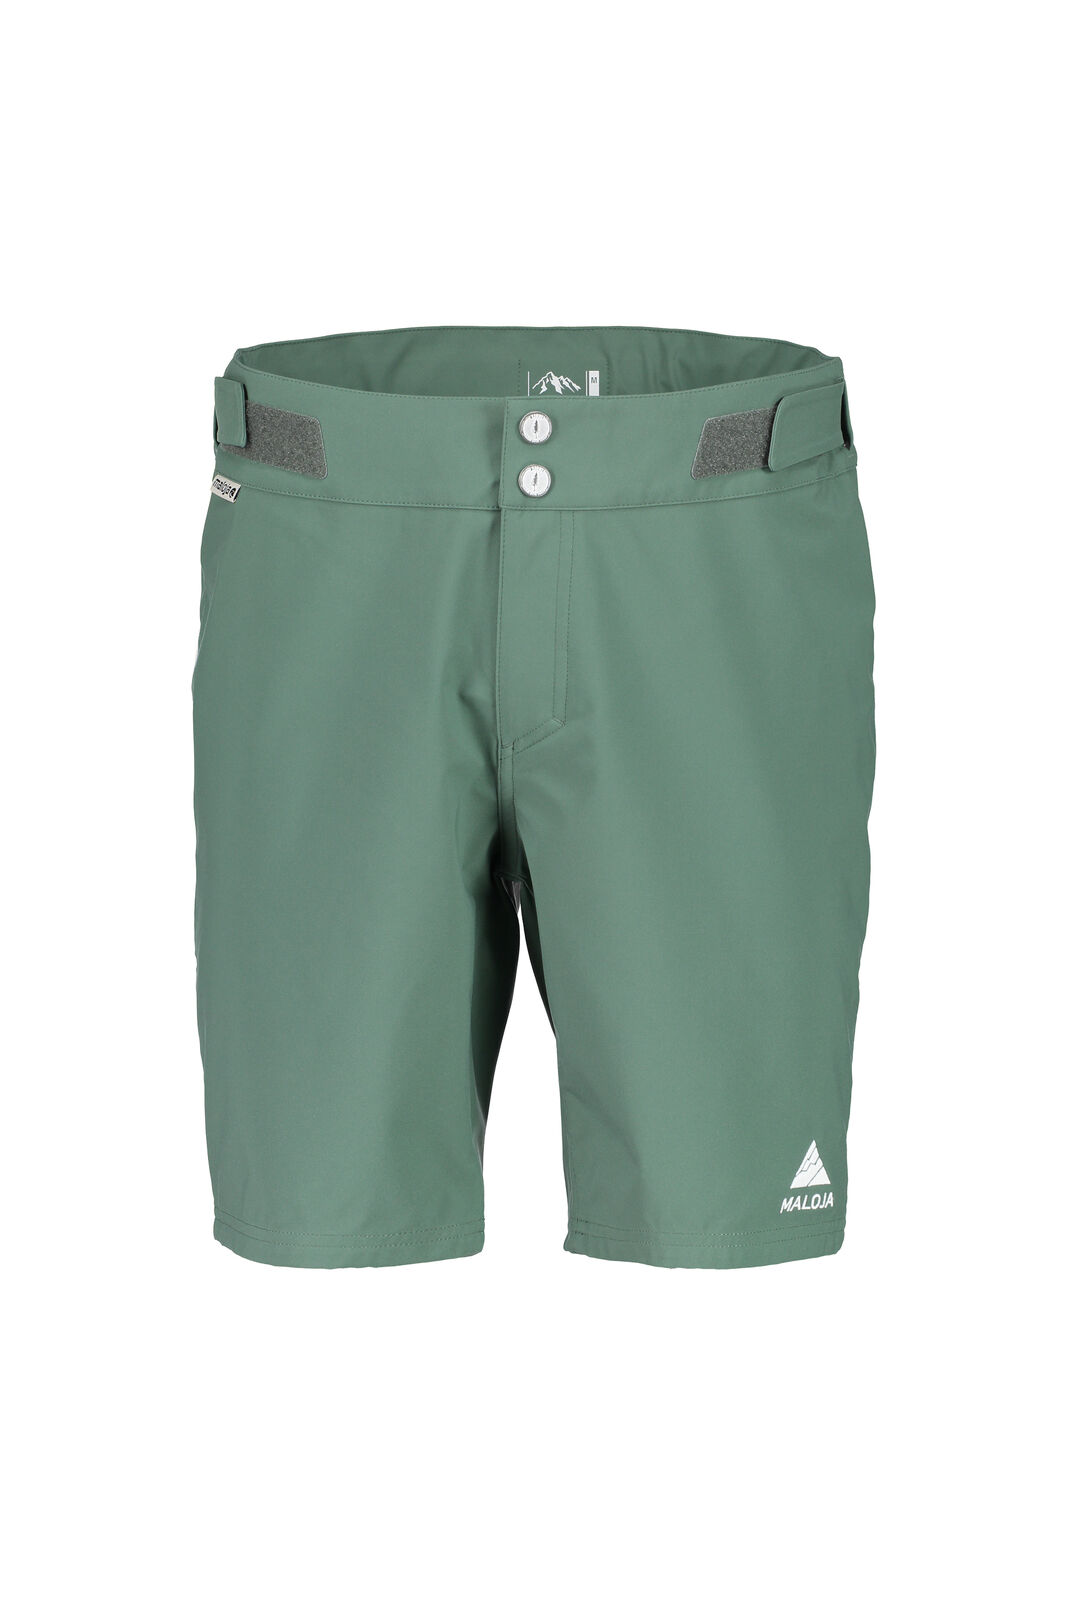 Malloja polipuerto shorts Bermudas verde Denver.Nivel 3.